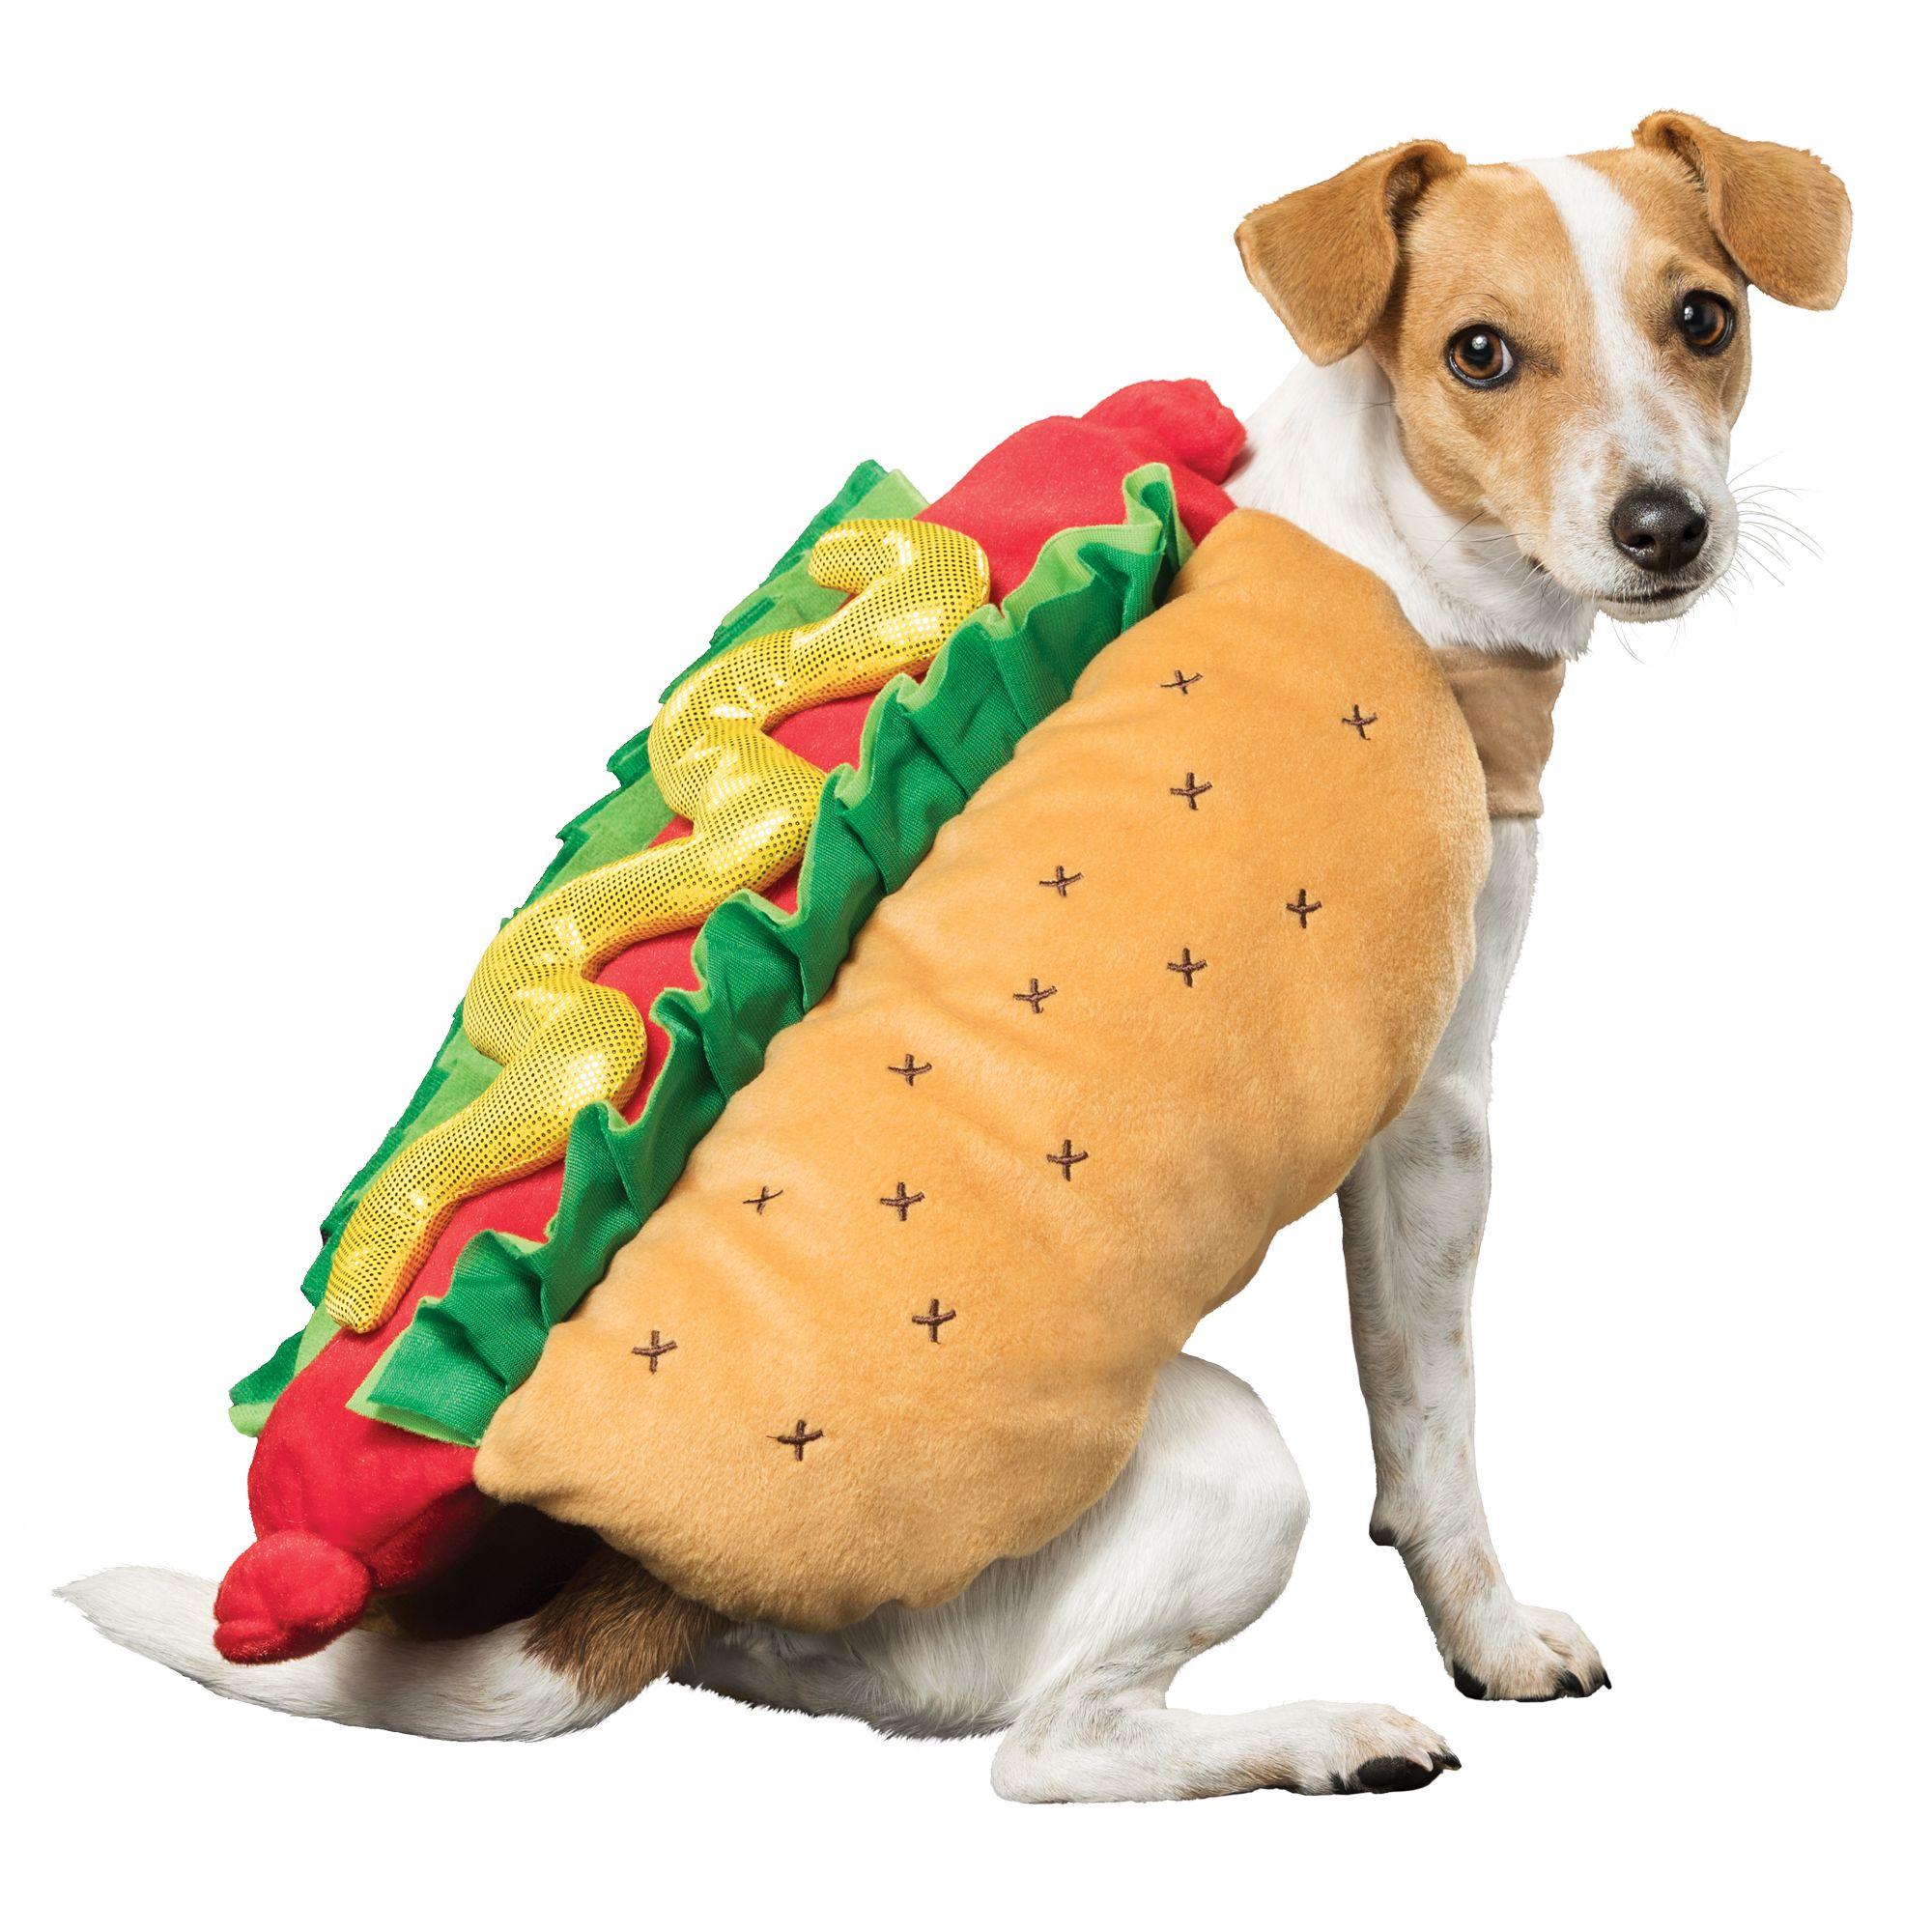 Thrills & Chills Halloween Hot Dog Costume